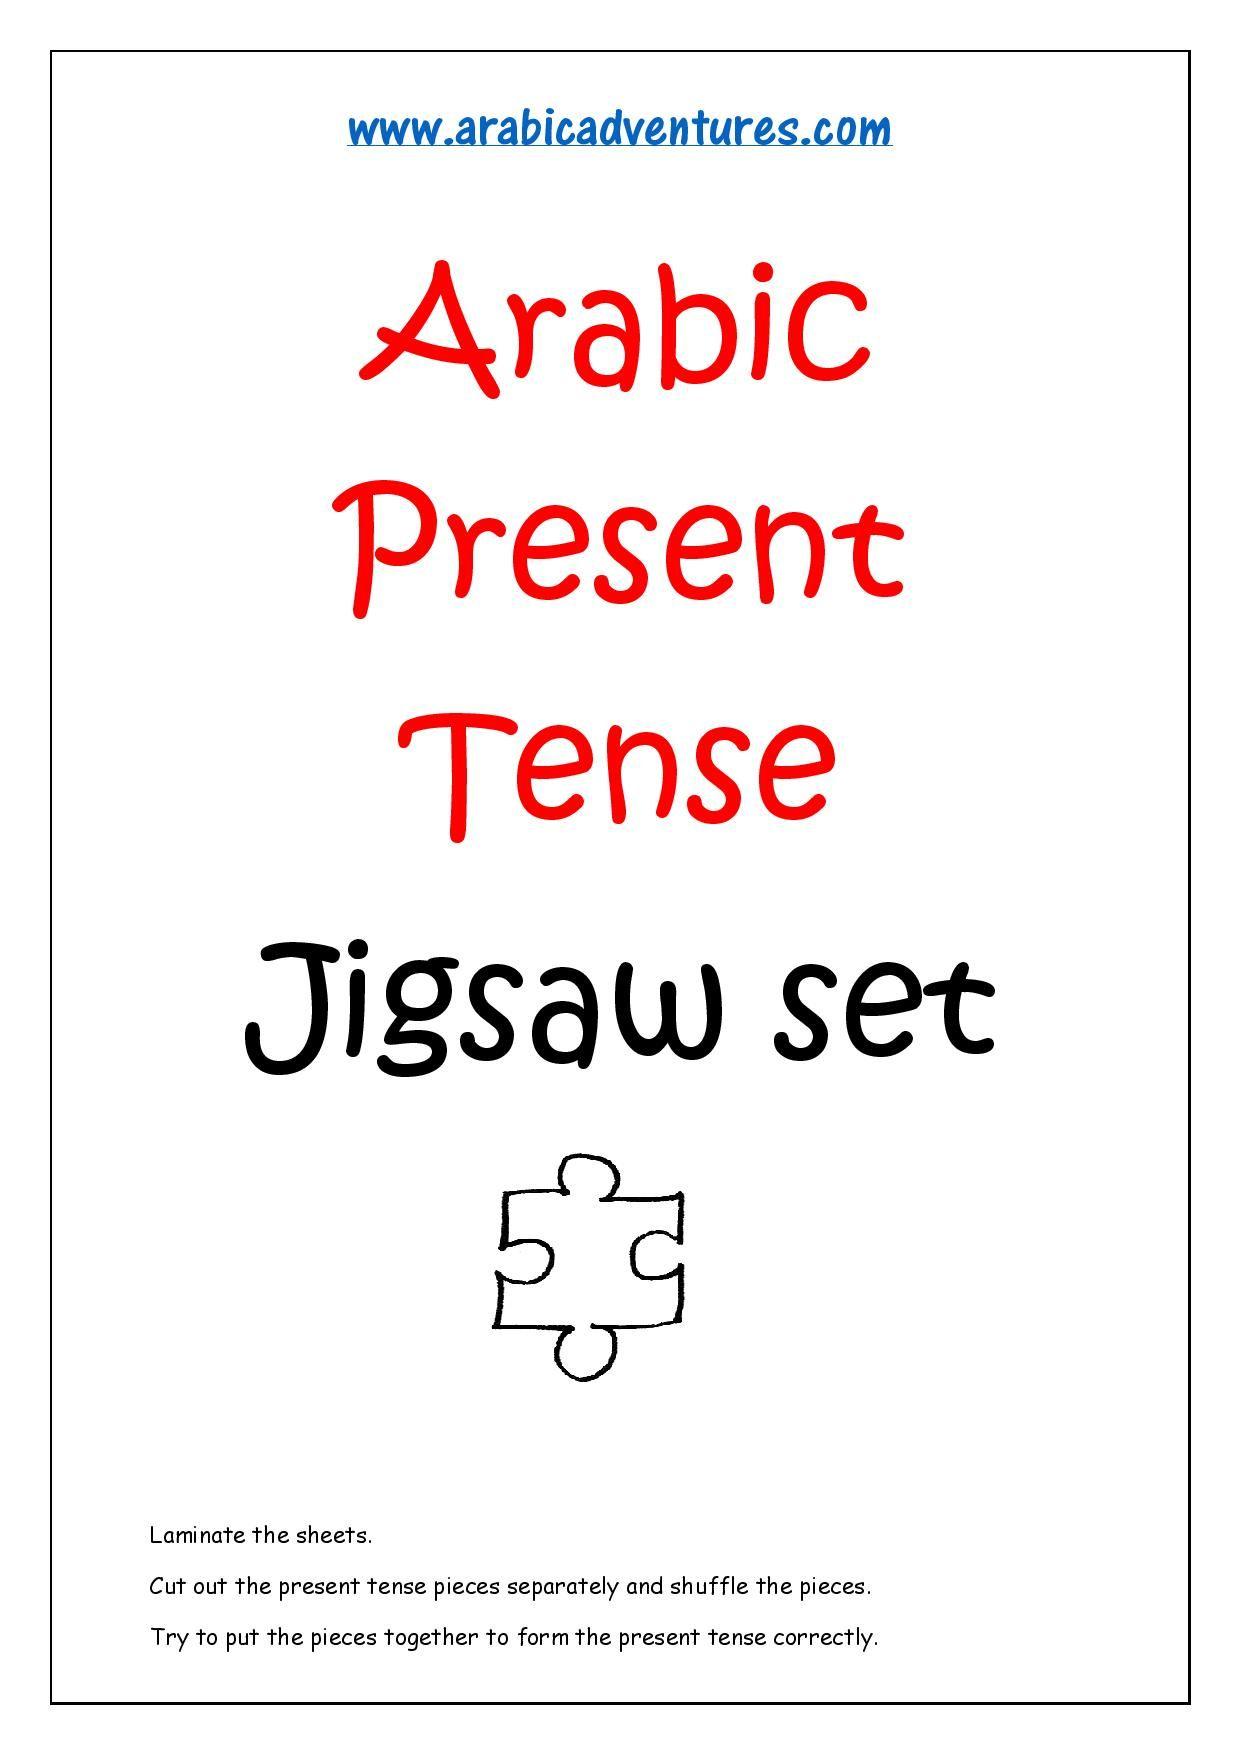 Arabic Present Tense Jigsaw Set